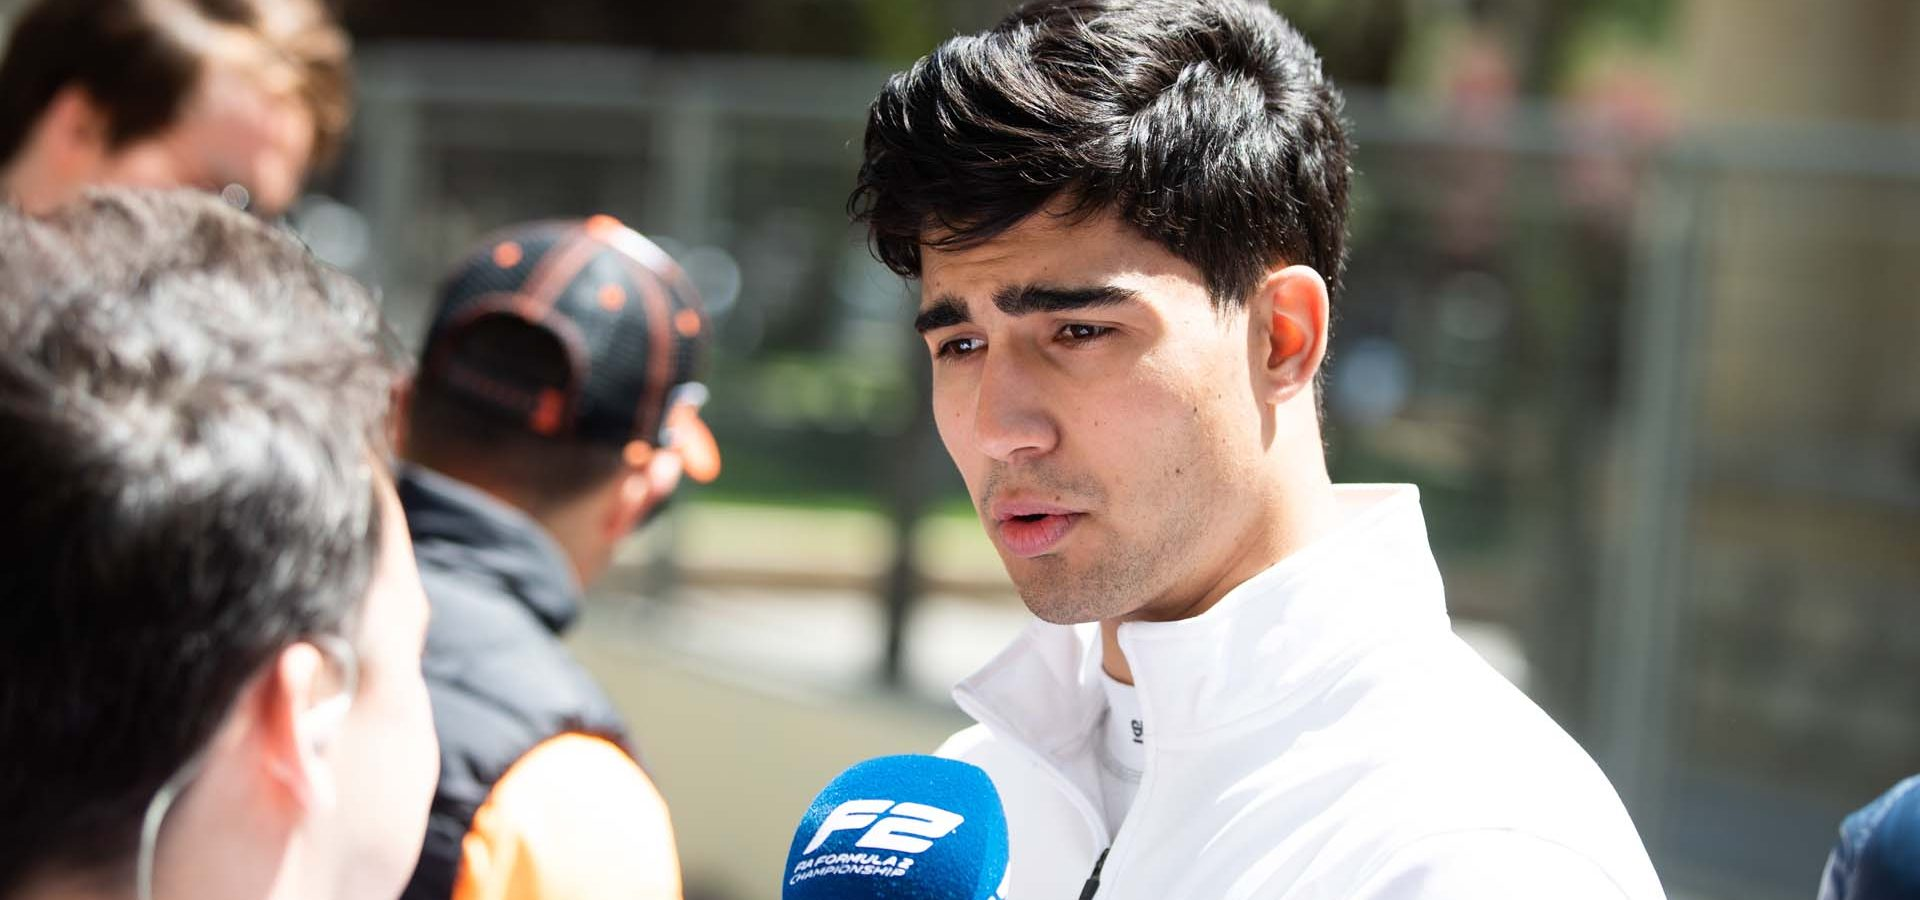 BAKU CITY CIRCUIT, AZERBAIJAN - APRIL 28: Juan Manuel Correa (USA, SAUBER JUNIOR TEAM BY CHAROUZ) during the Baku at Baku City Circuit on April 28, 2019 in Baku City Circuit, Azerbaijan. (Photo by Joe Portlock / LAT Images / FIA F2 Championship)